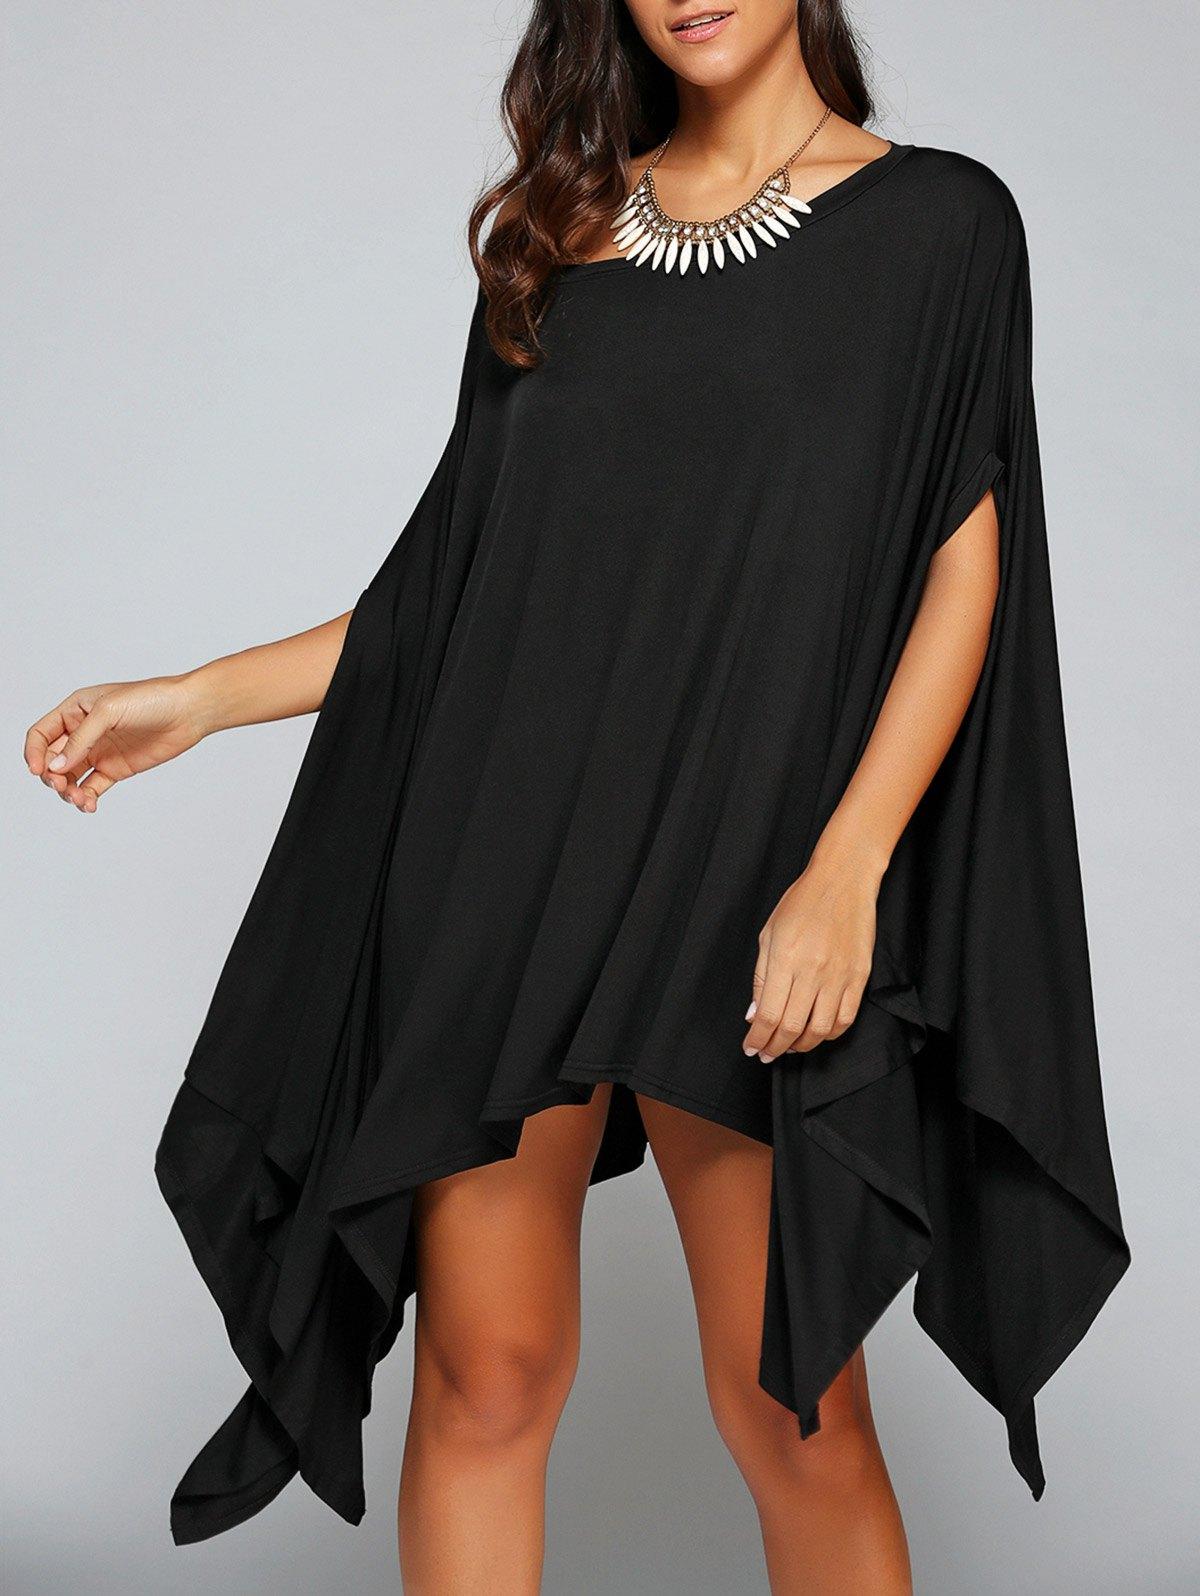 Bat-Wing Sleeve One-Shoulder Loose Asymmetric Dress